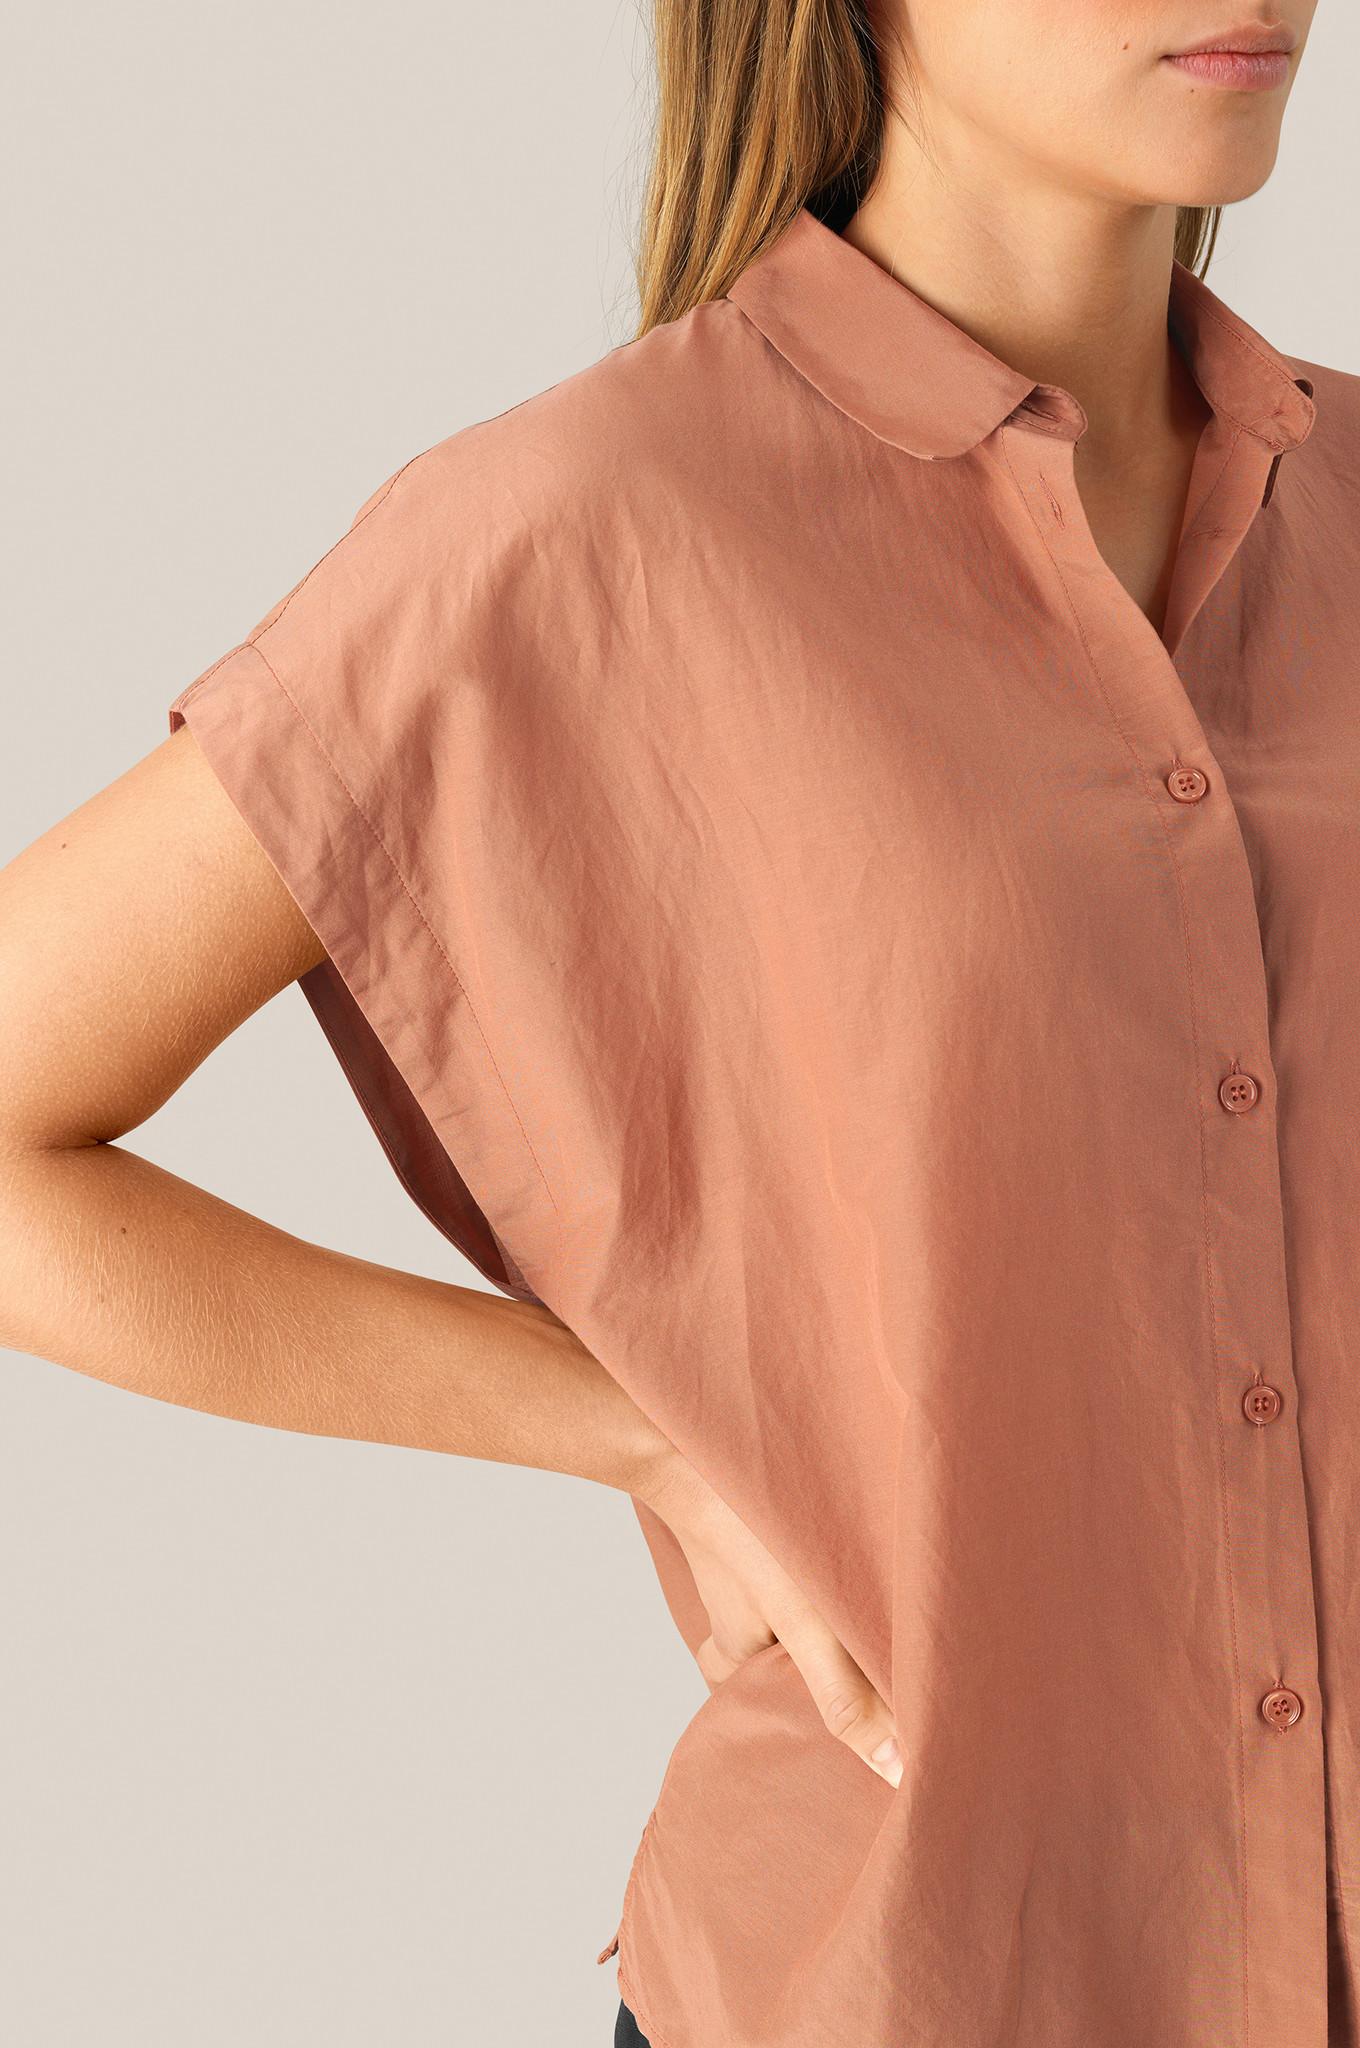 Auso Shirt - Black Beauty S-3